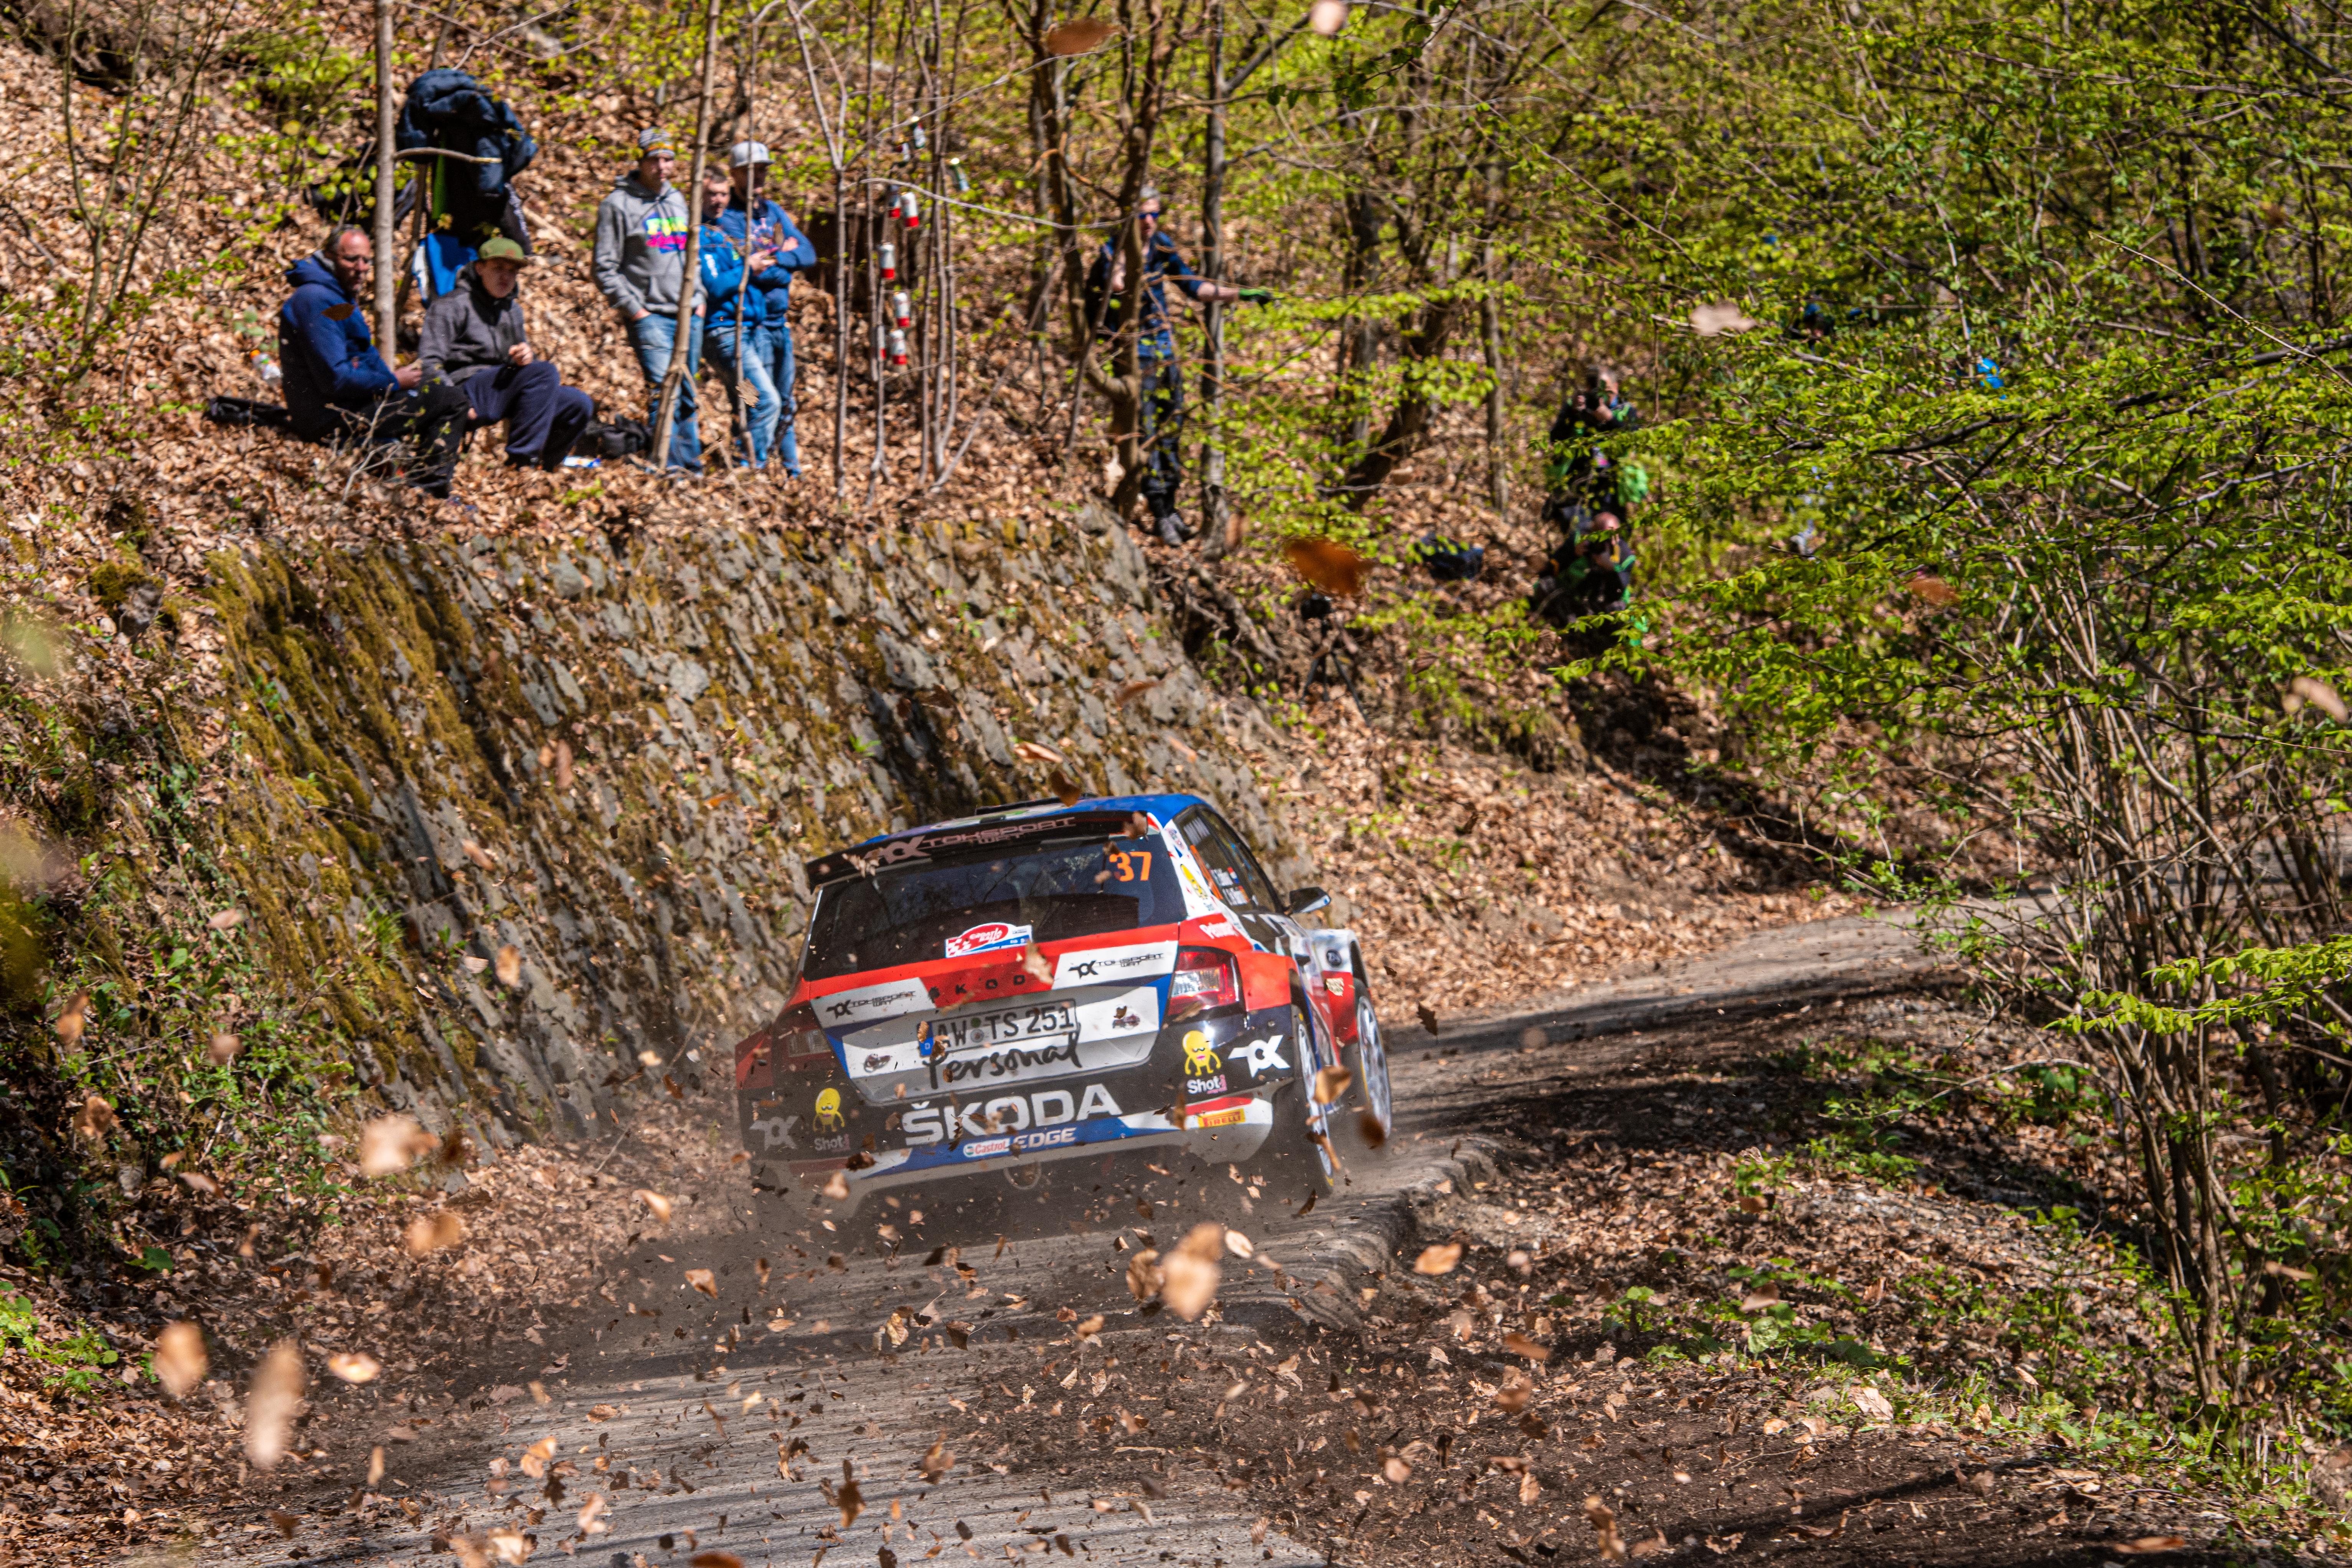 Rally Croatia: SKODA FABIA Rally2 evo crews storm to convincing 1-2-3 in WRC3 category - Image 7